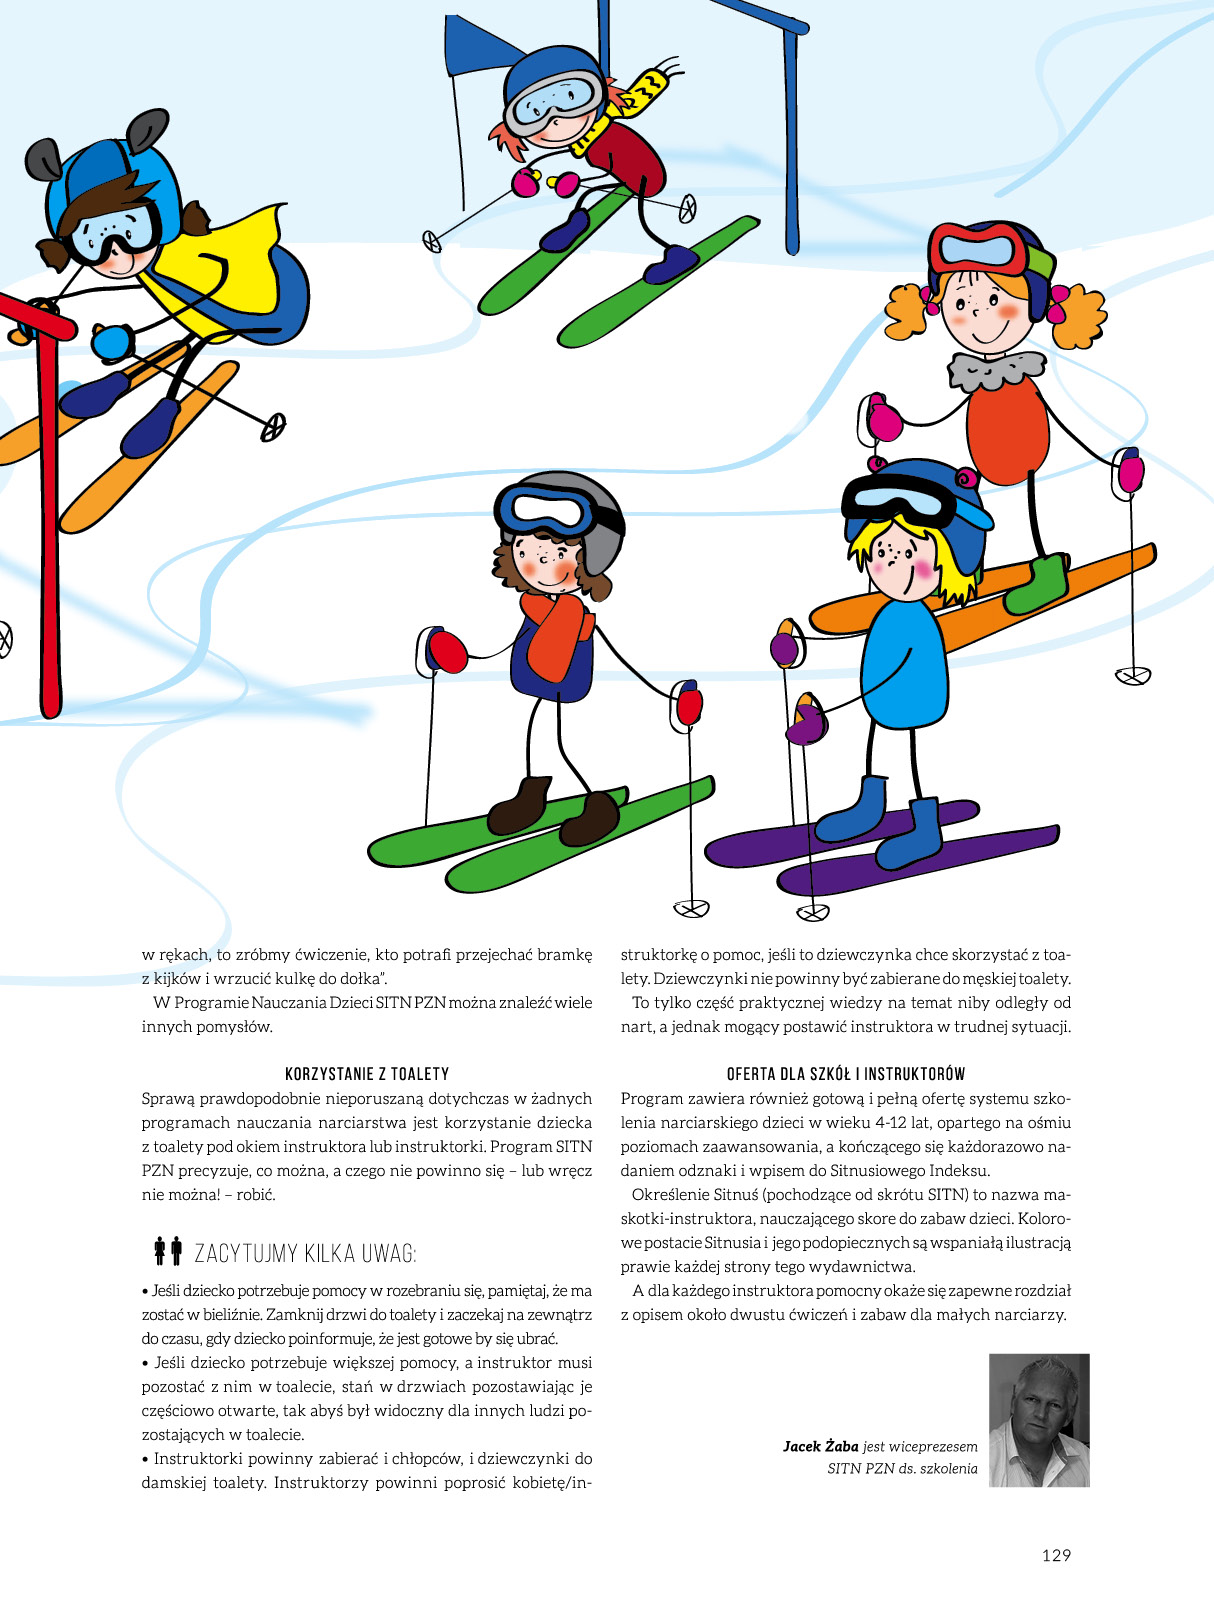 ski_71129